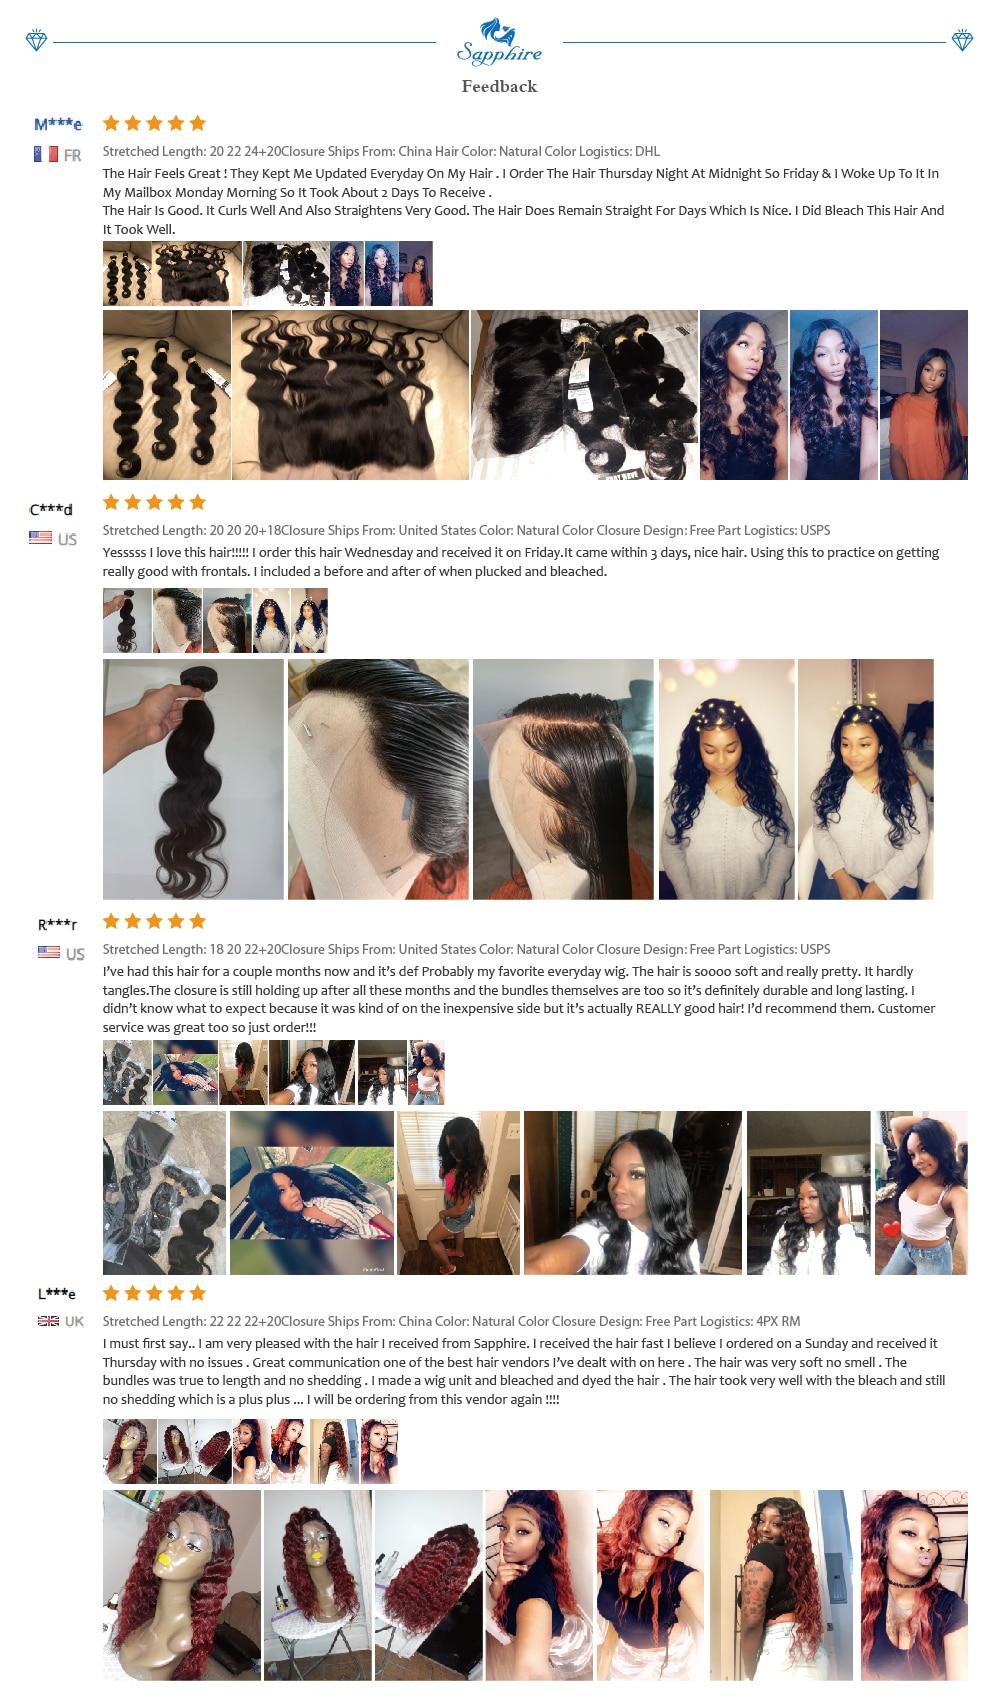 H2db70f51d3c8494091c547df0d406f7cv Sapphire Brazilian Hair Weave Bundles Body Wave Bundles With Frontal Human Hair 3 Bundles With Closure Frontal Hair Extension